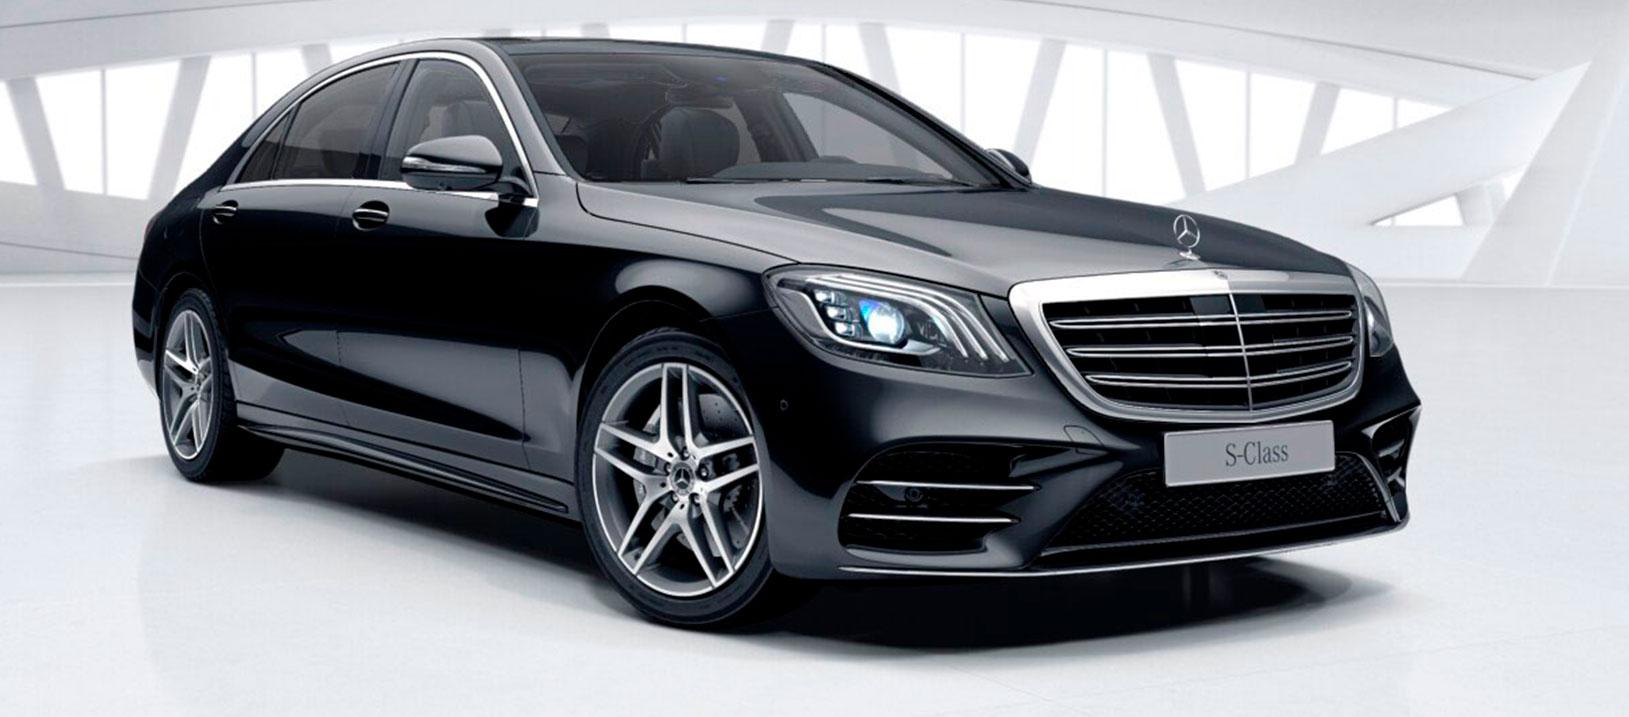 Mercedes-Benz S 400 d 4MATIC long 52600210